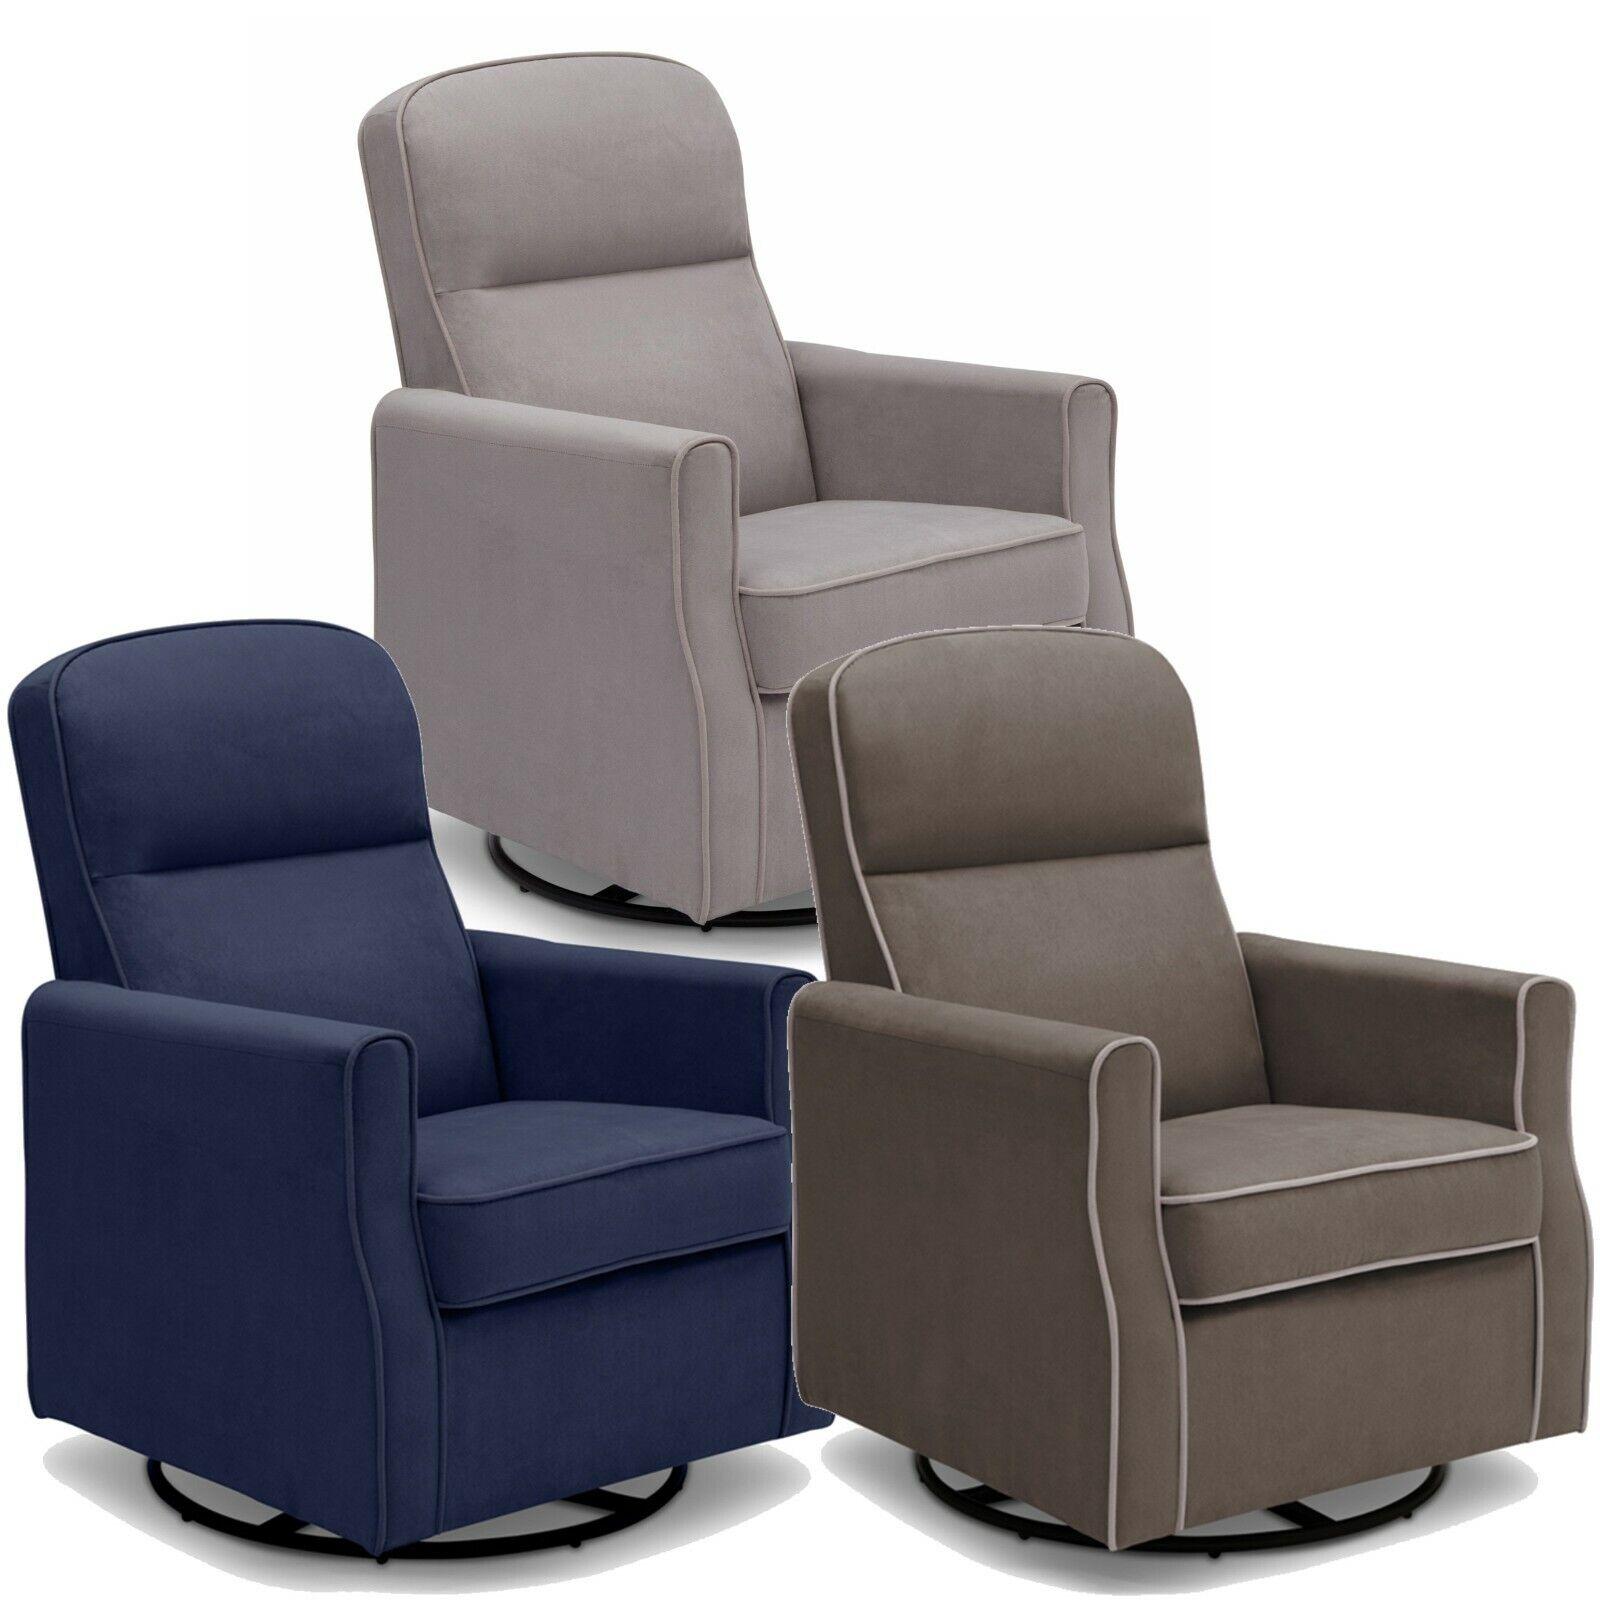 Glider Swivel Rocker Chair Dove Grey